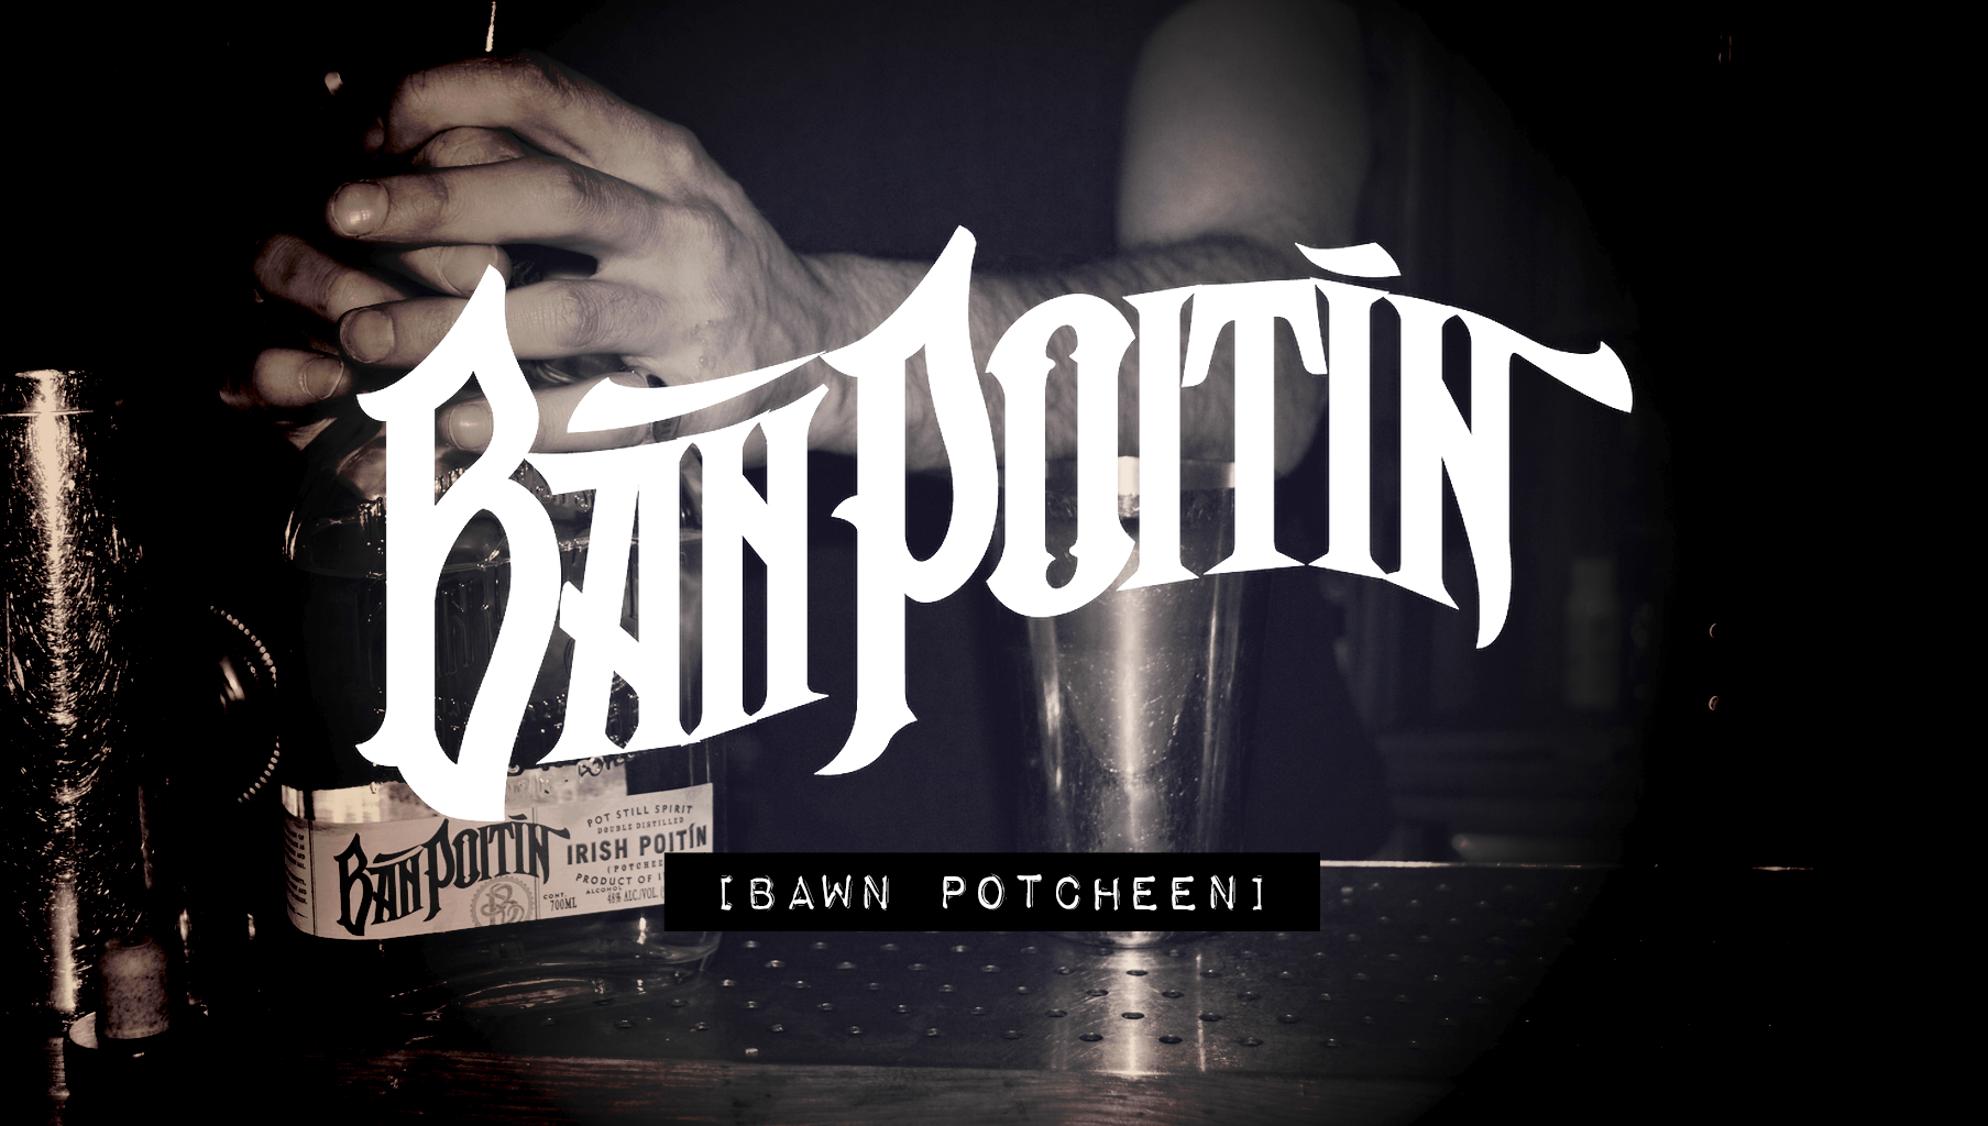 Ban poitin logo with it's pronounced Bawn Potcheen